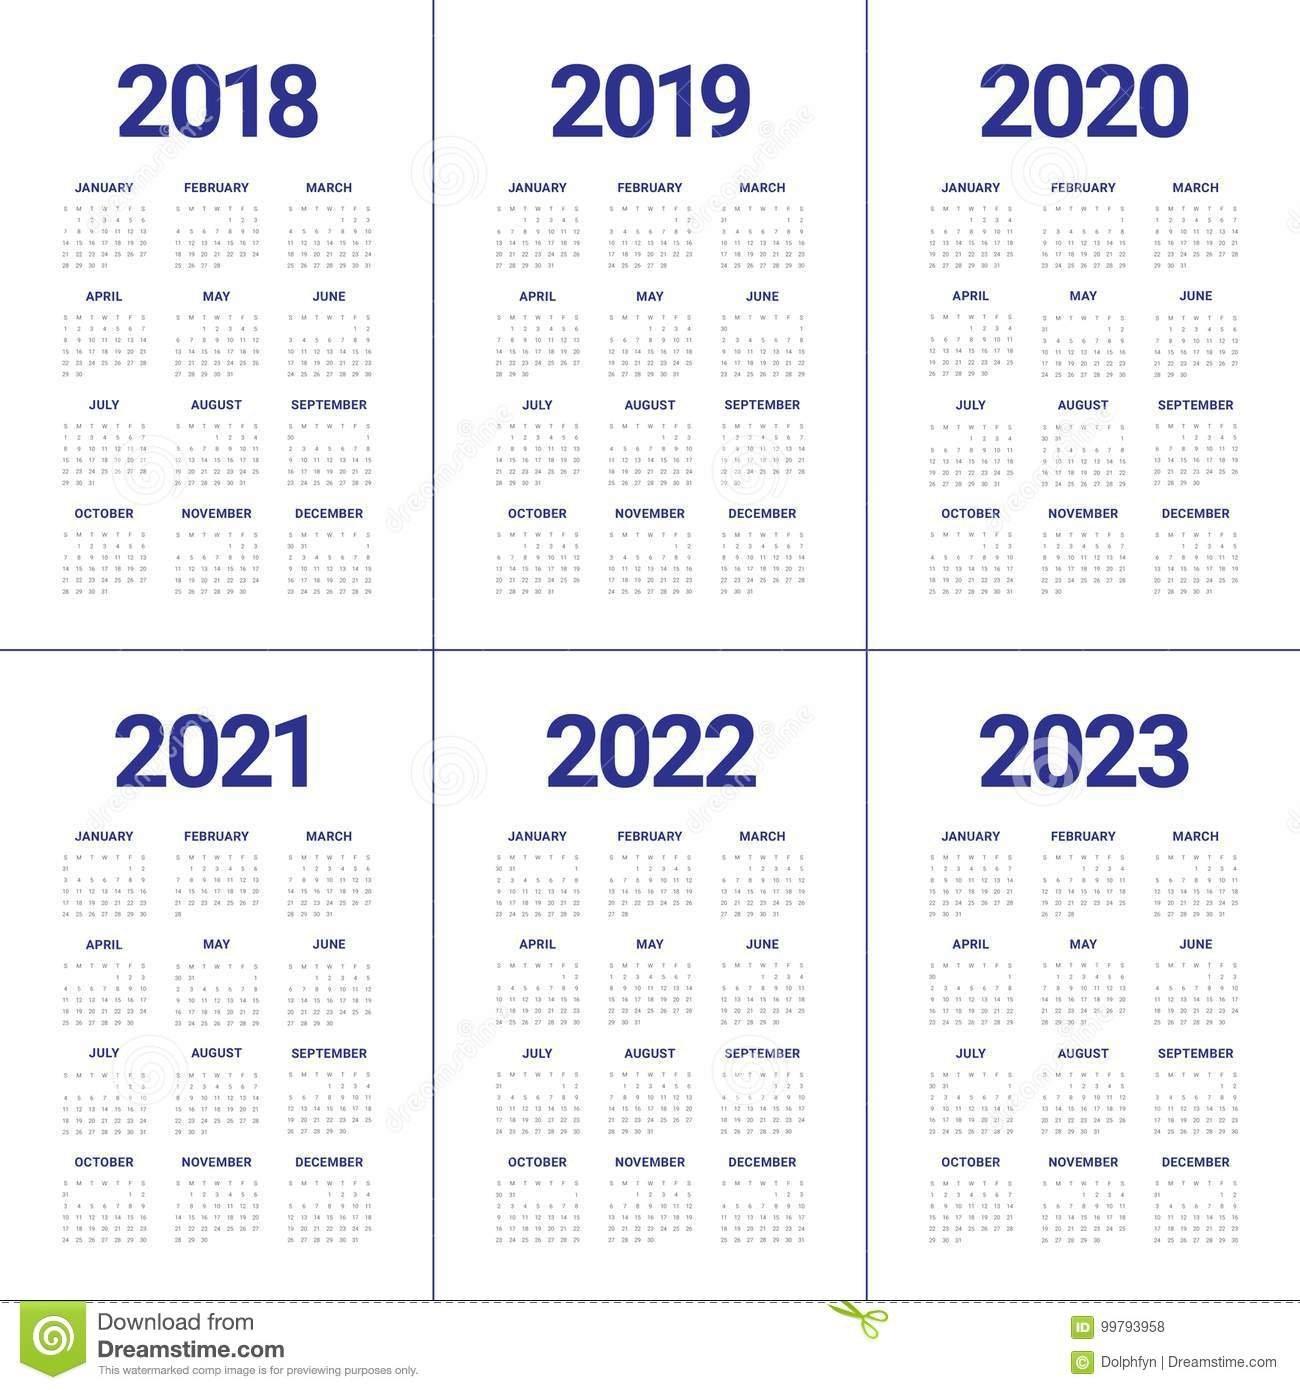 3 Year Calendar 2021 To 2023 | Calendar Printables Free Blank in 3 Year Printable Calendar 2021 2021 2022 Graphics